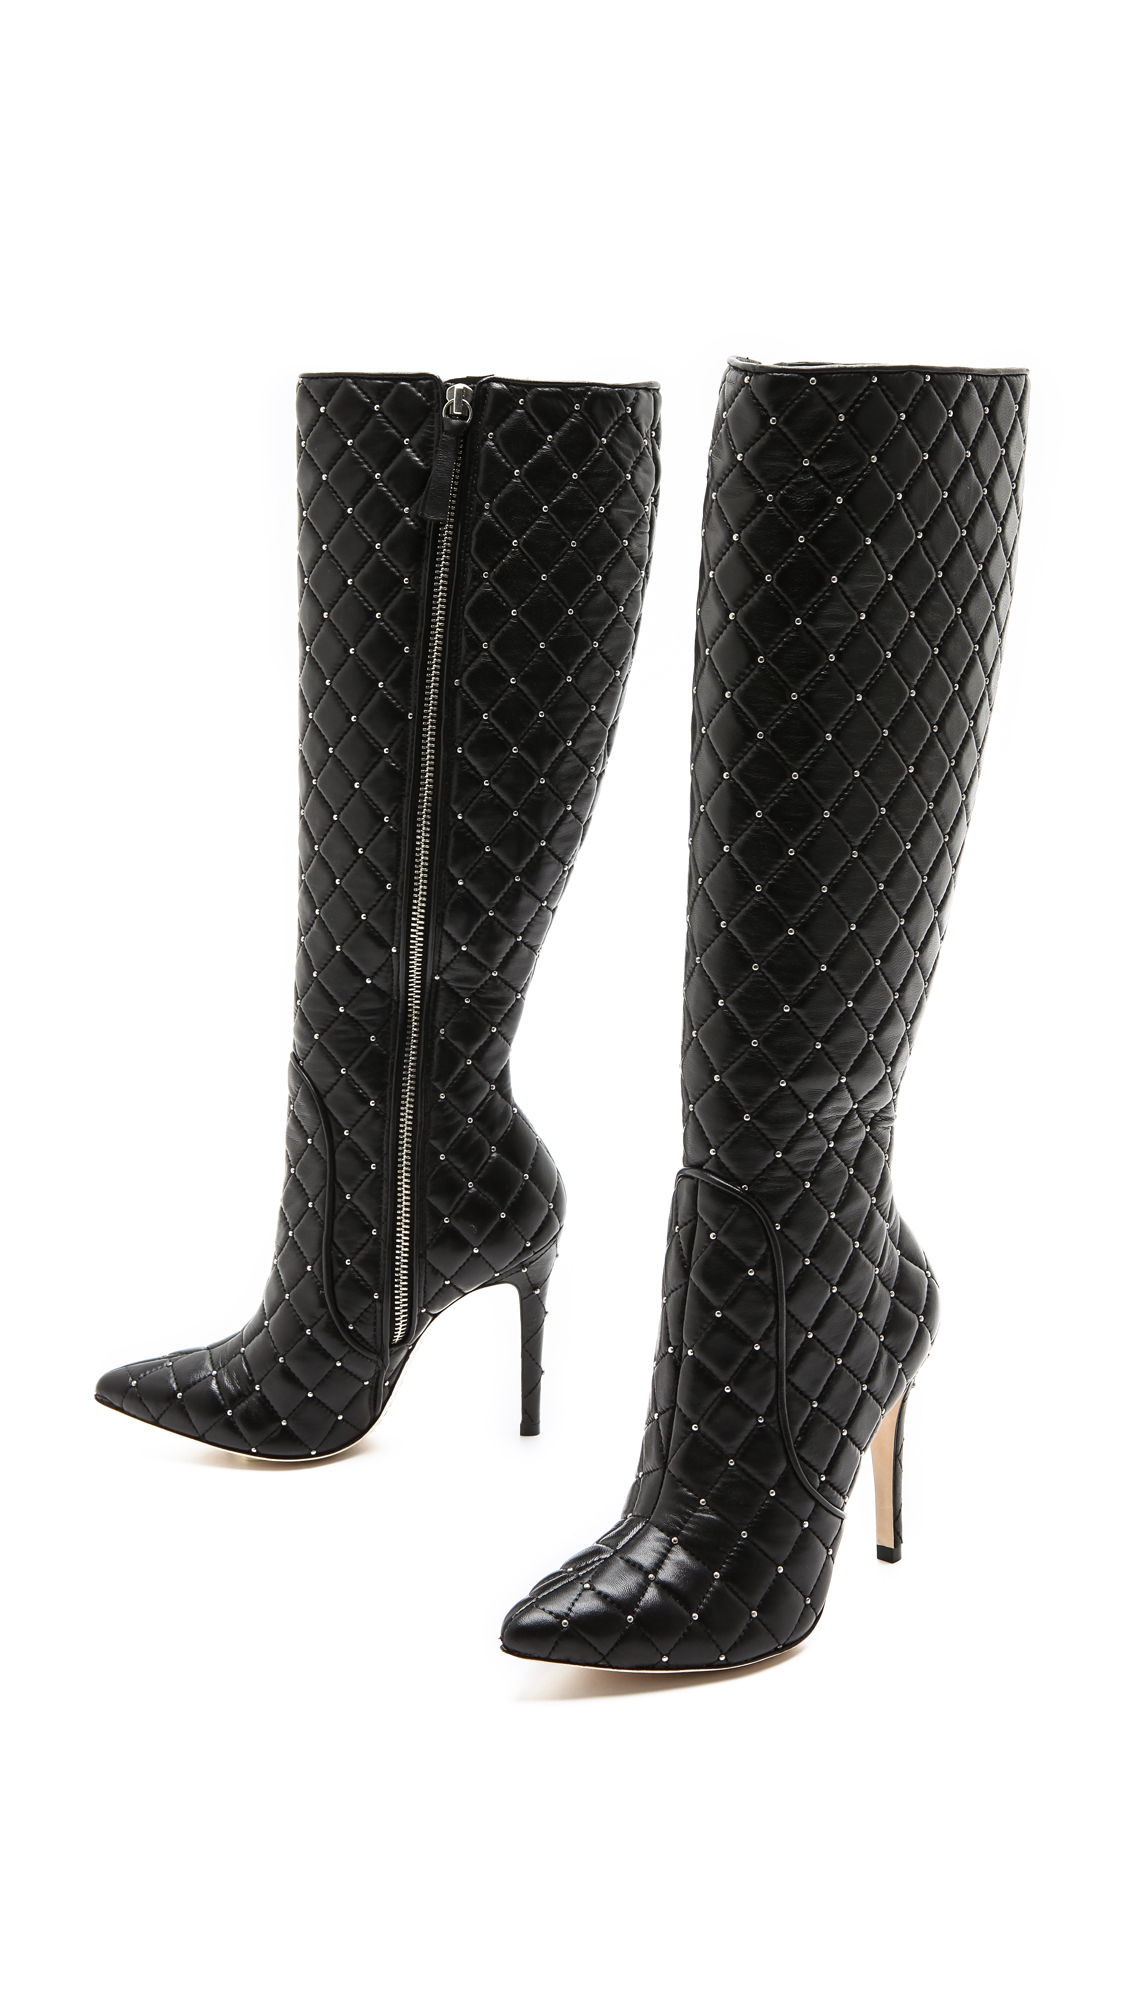 ALICE+OLIVIA Boots Fiable À Vendre Footlocker Jeu Finishline P5nnlY